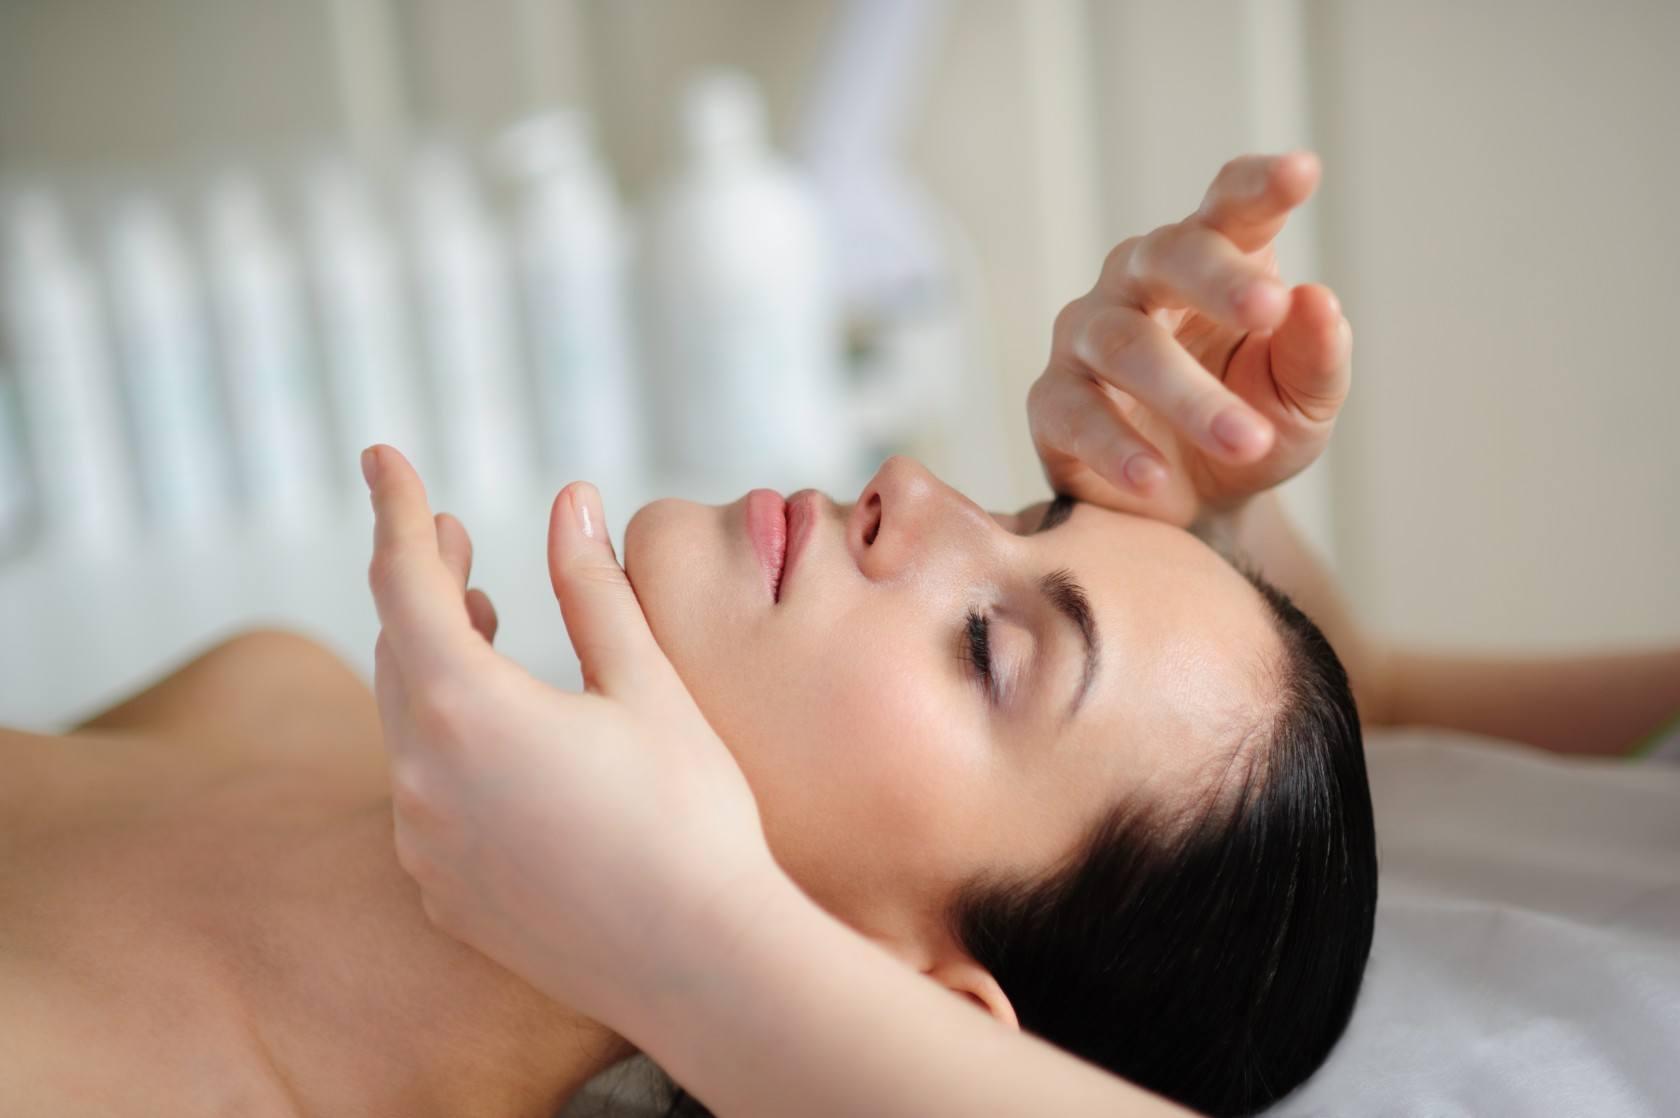 массаж асахи для лица после 40 ошибка